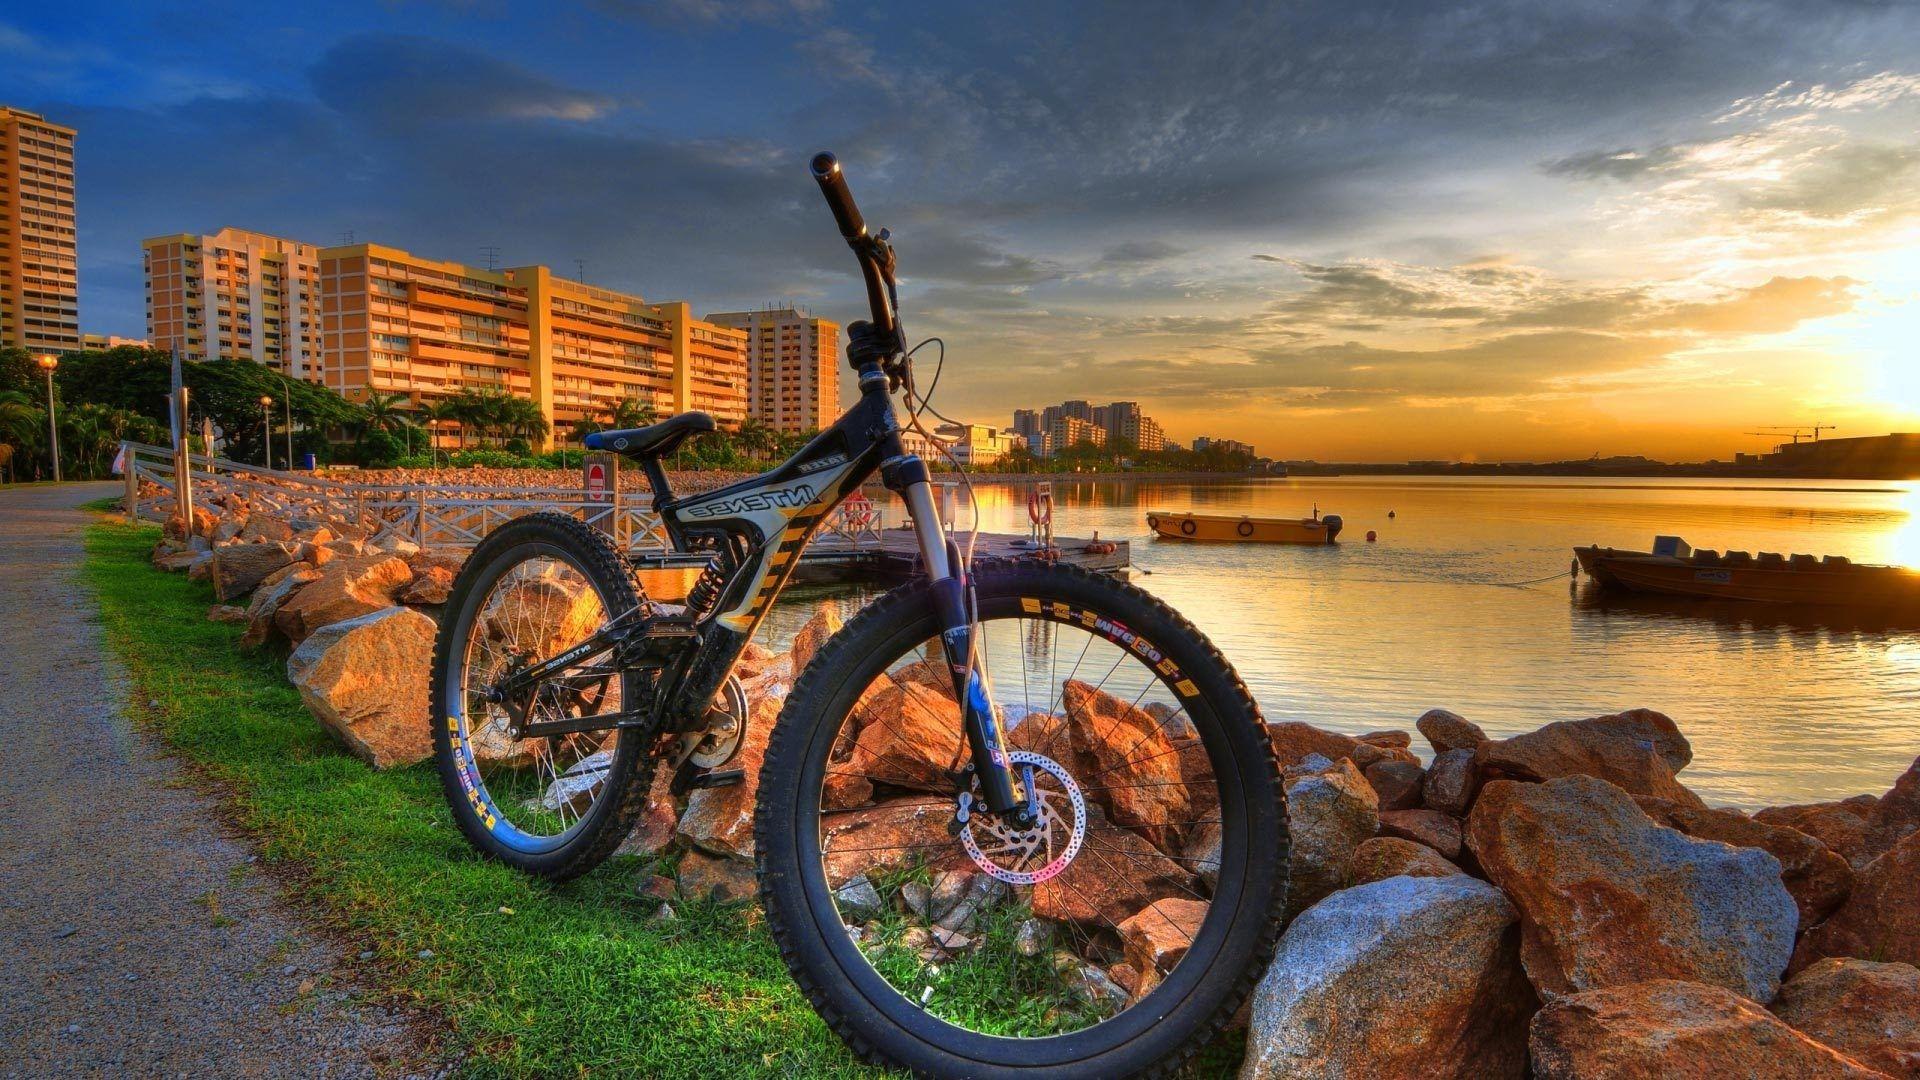 Mountain Bike download nice wallpaper